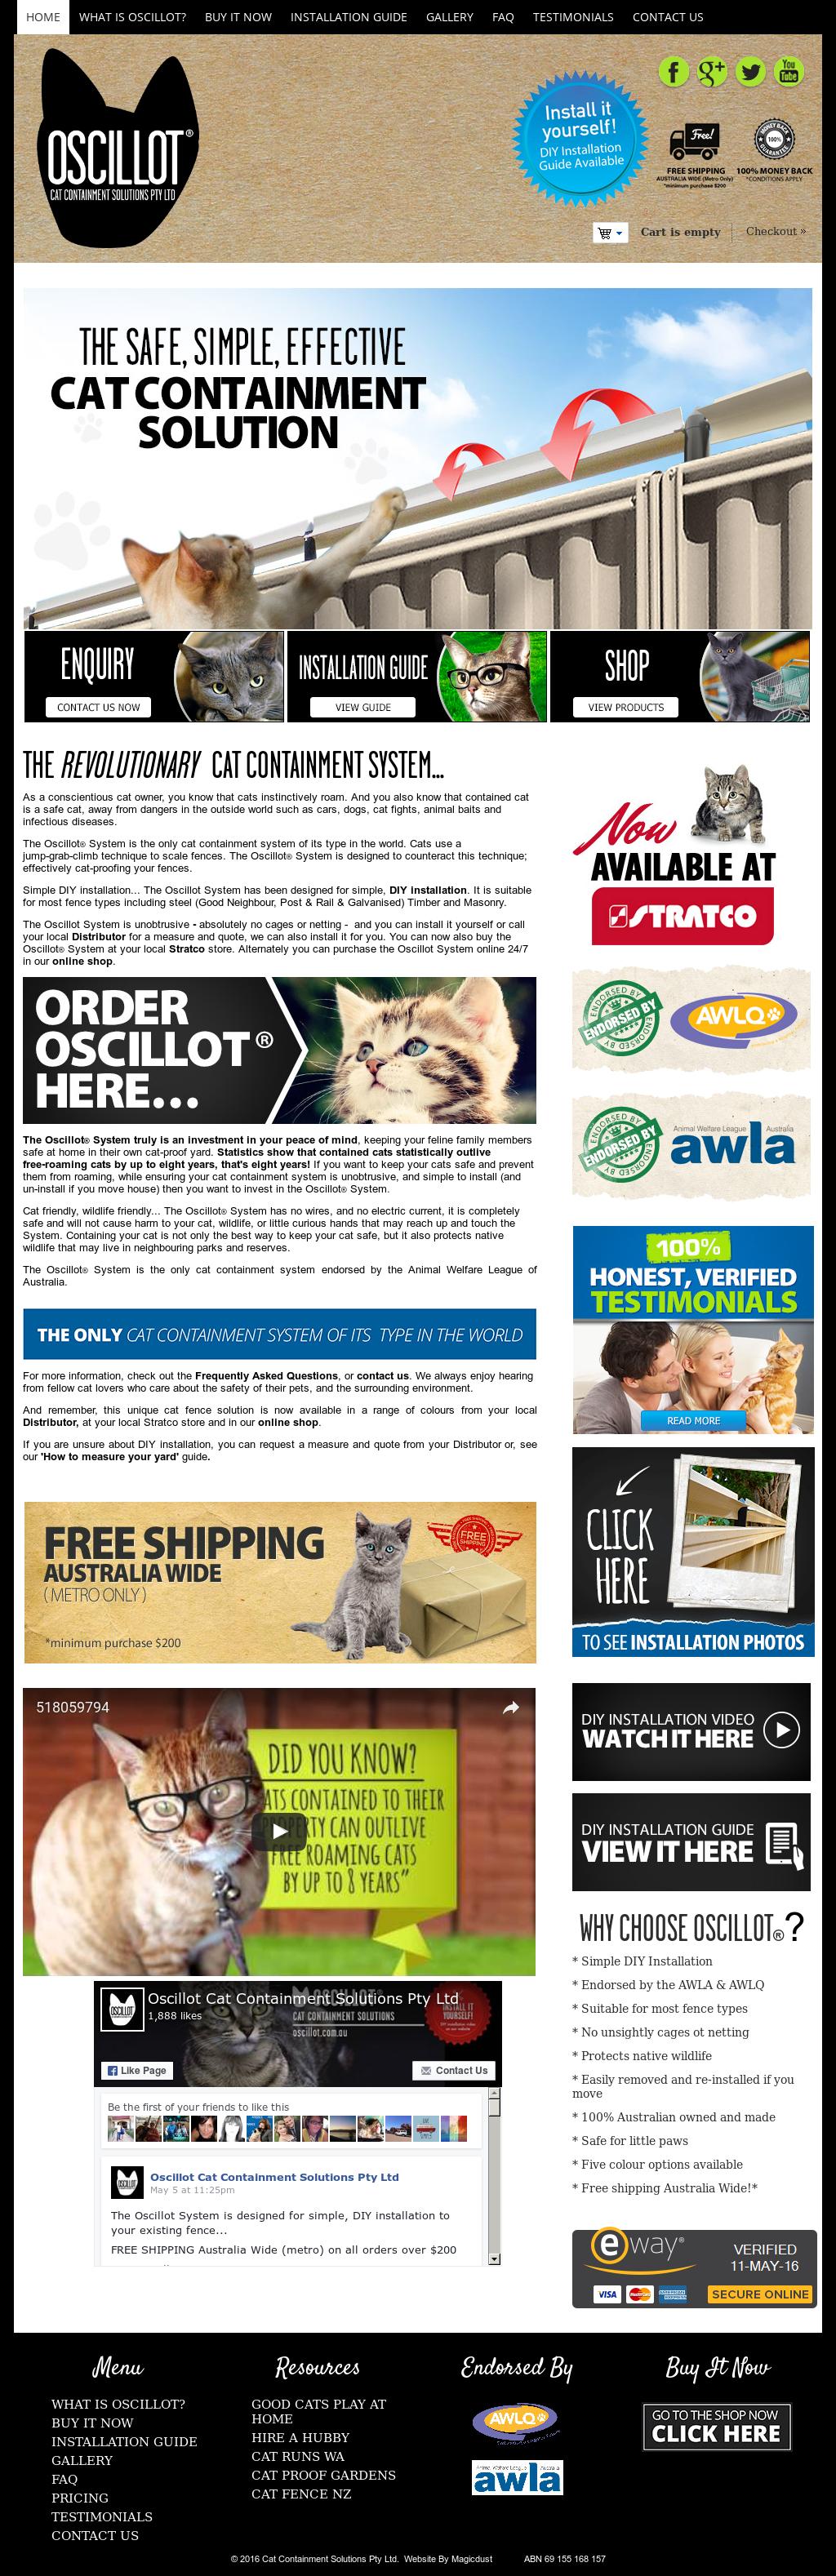 Oscillot Cat Containment Solutions Competitors, Revenue and